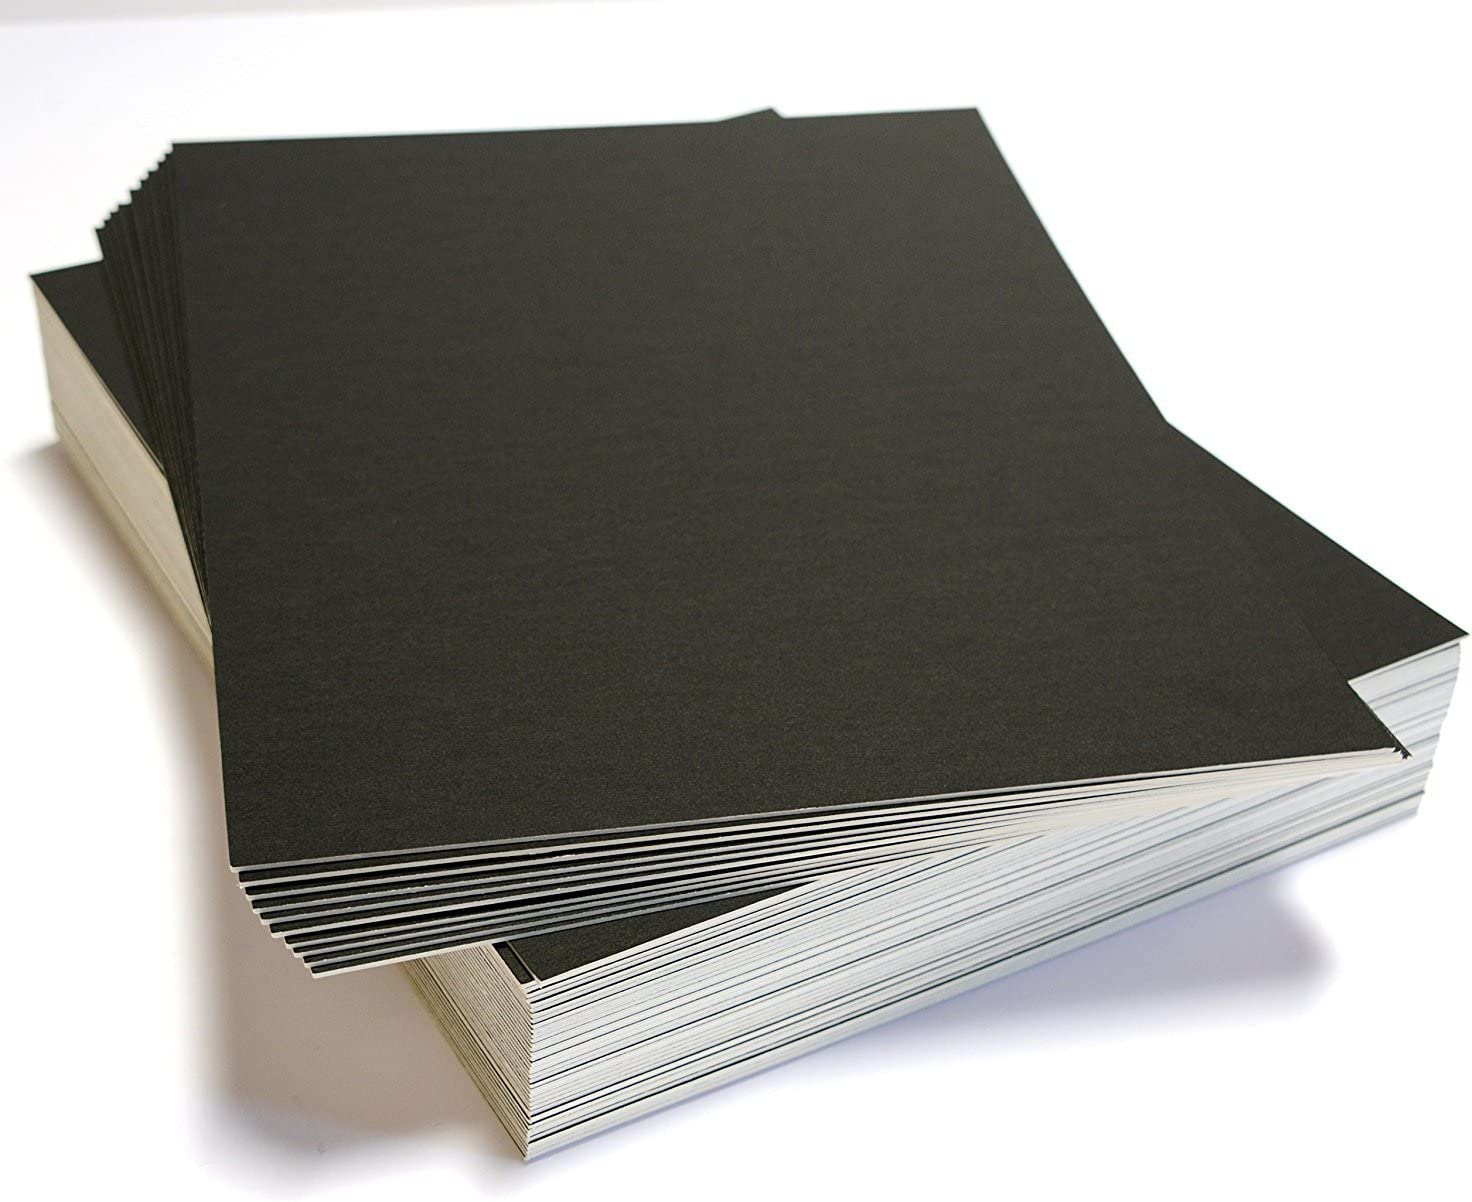 topseller100, Pack of 50 sheets 11x14 UNCUT matboard / mat boards (Black)